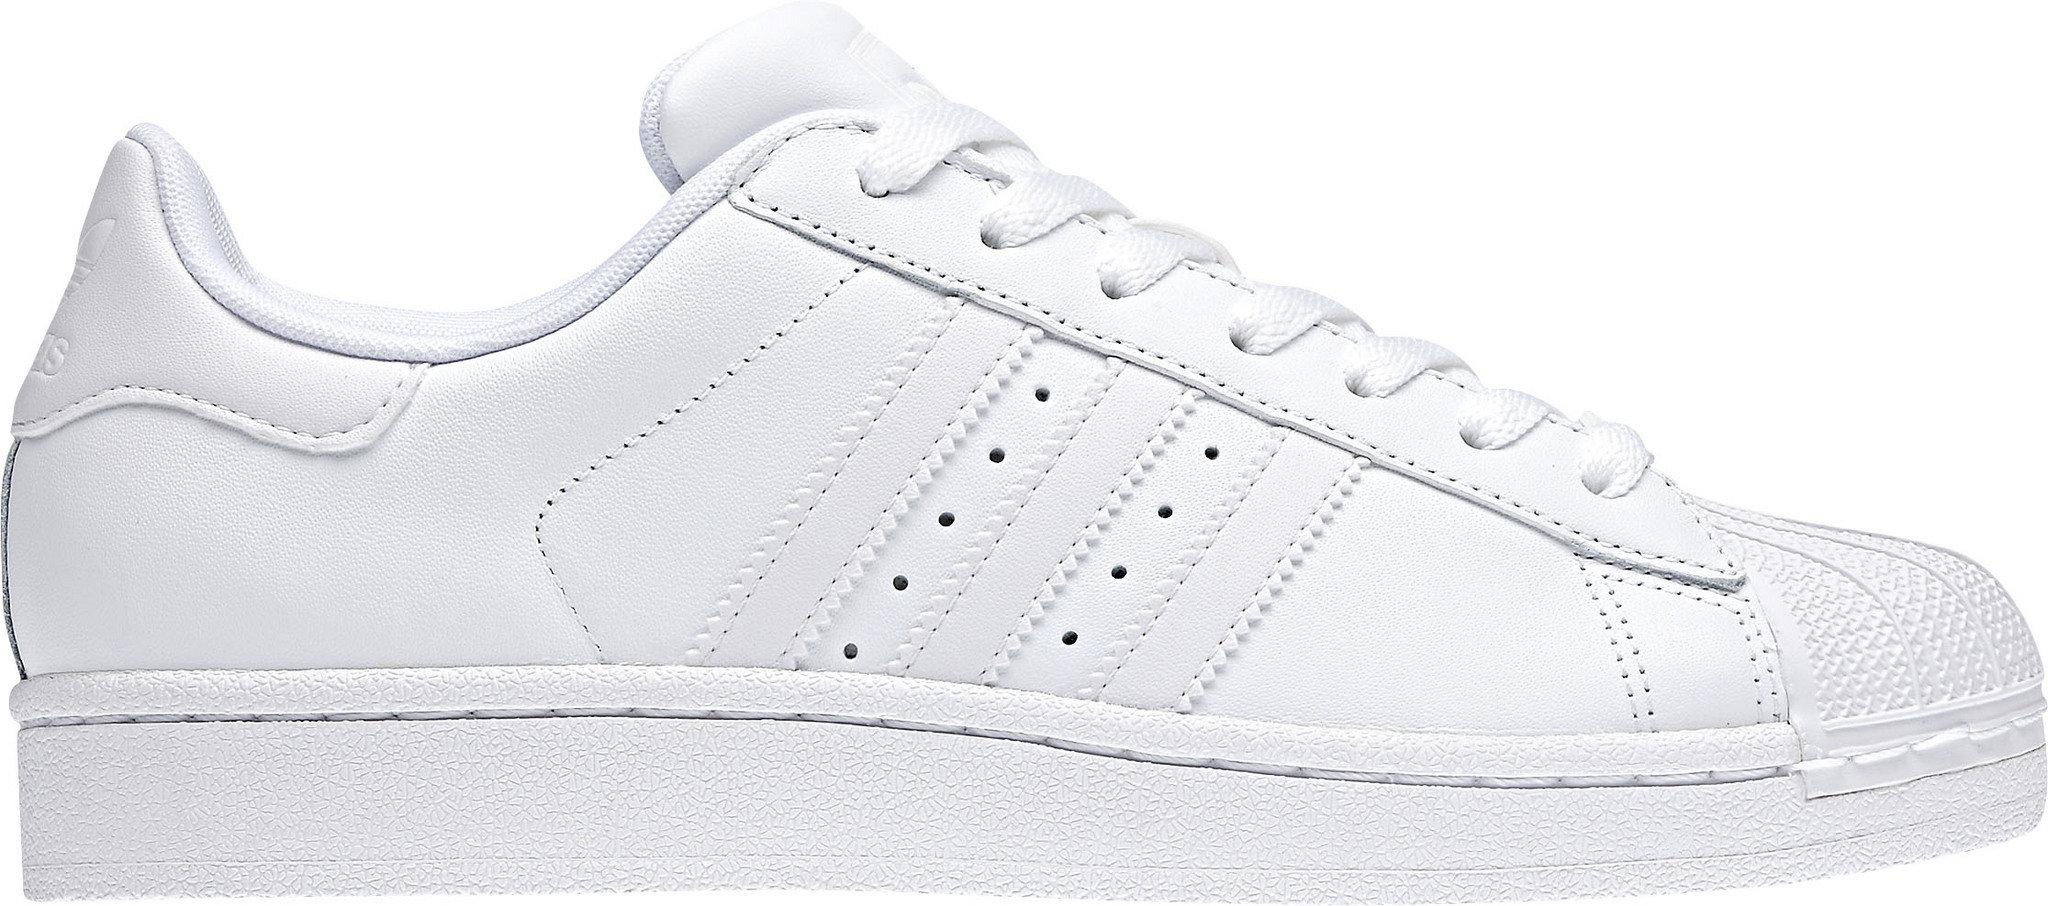 Adidas Re Introduces 4 Originals In Lifestyle Shoe